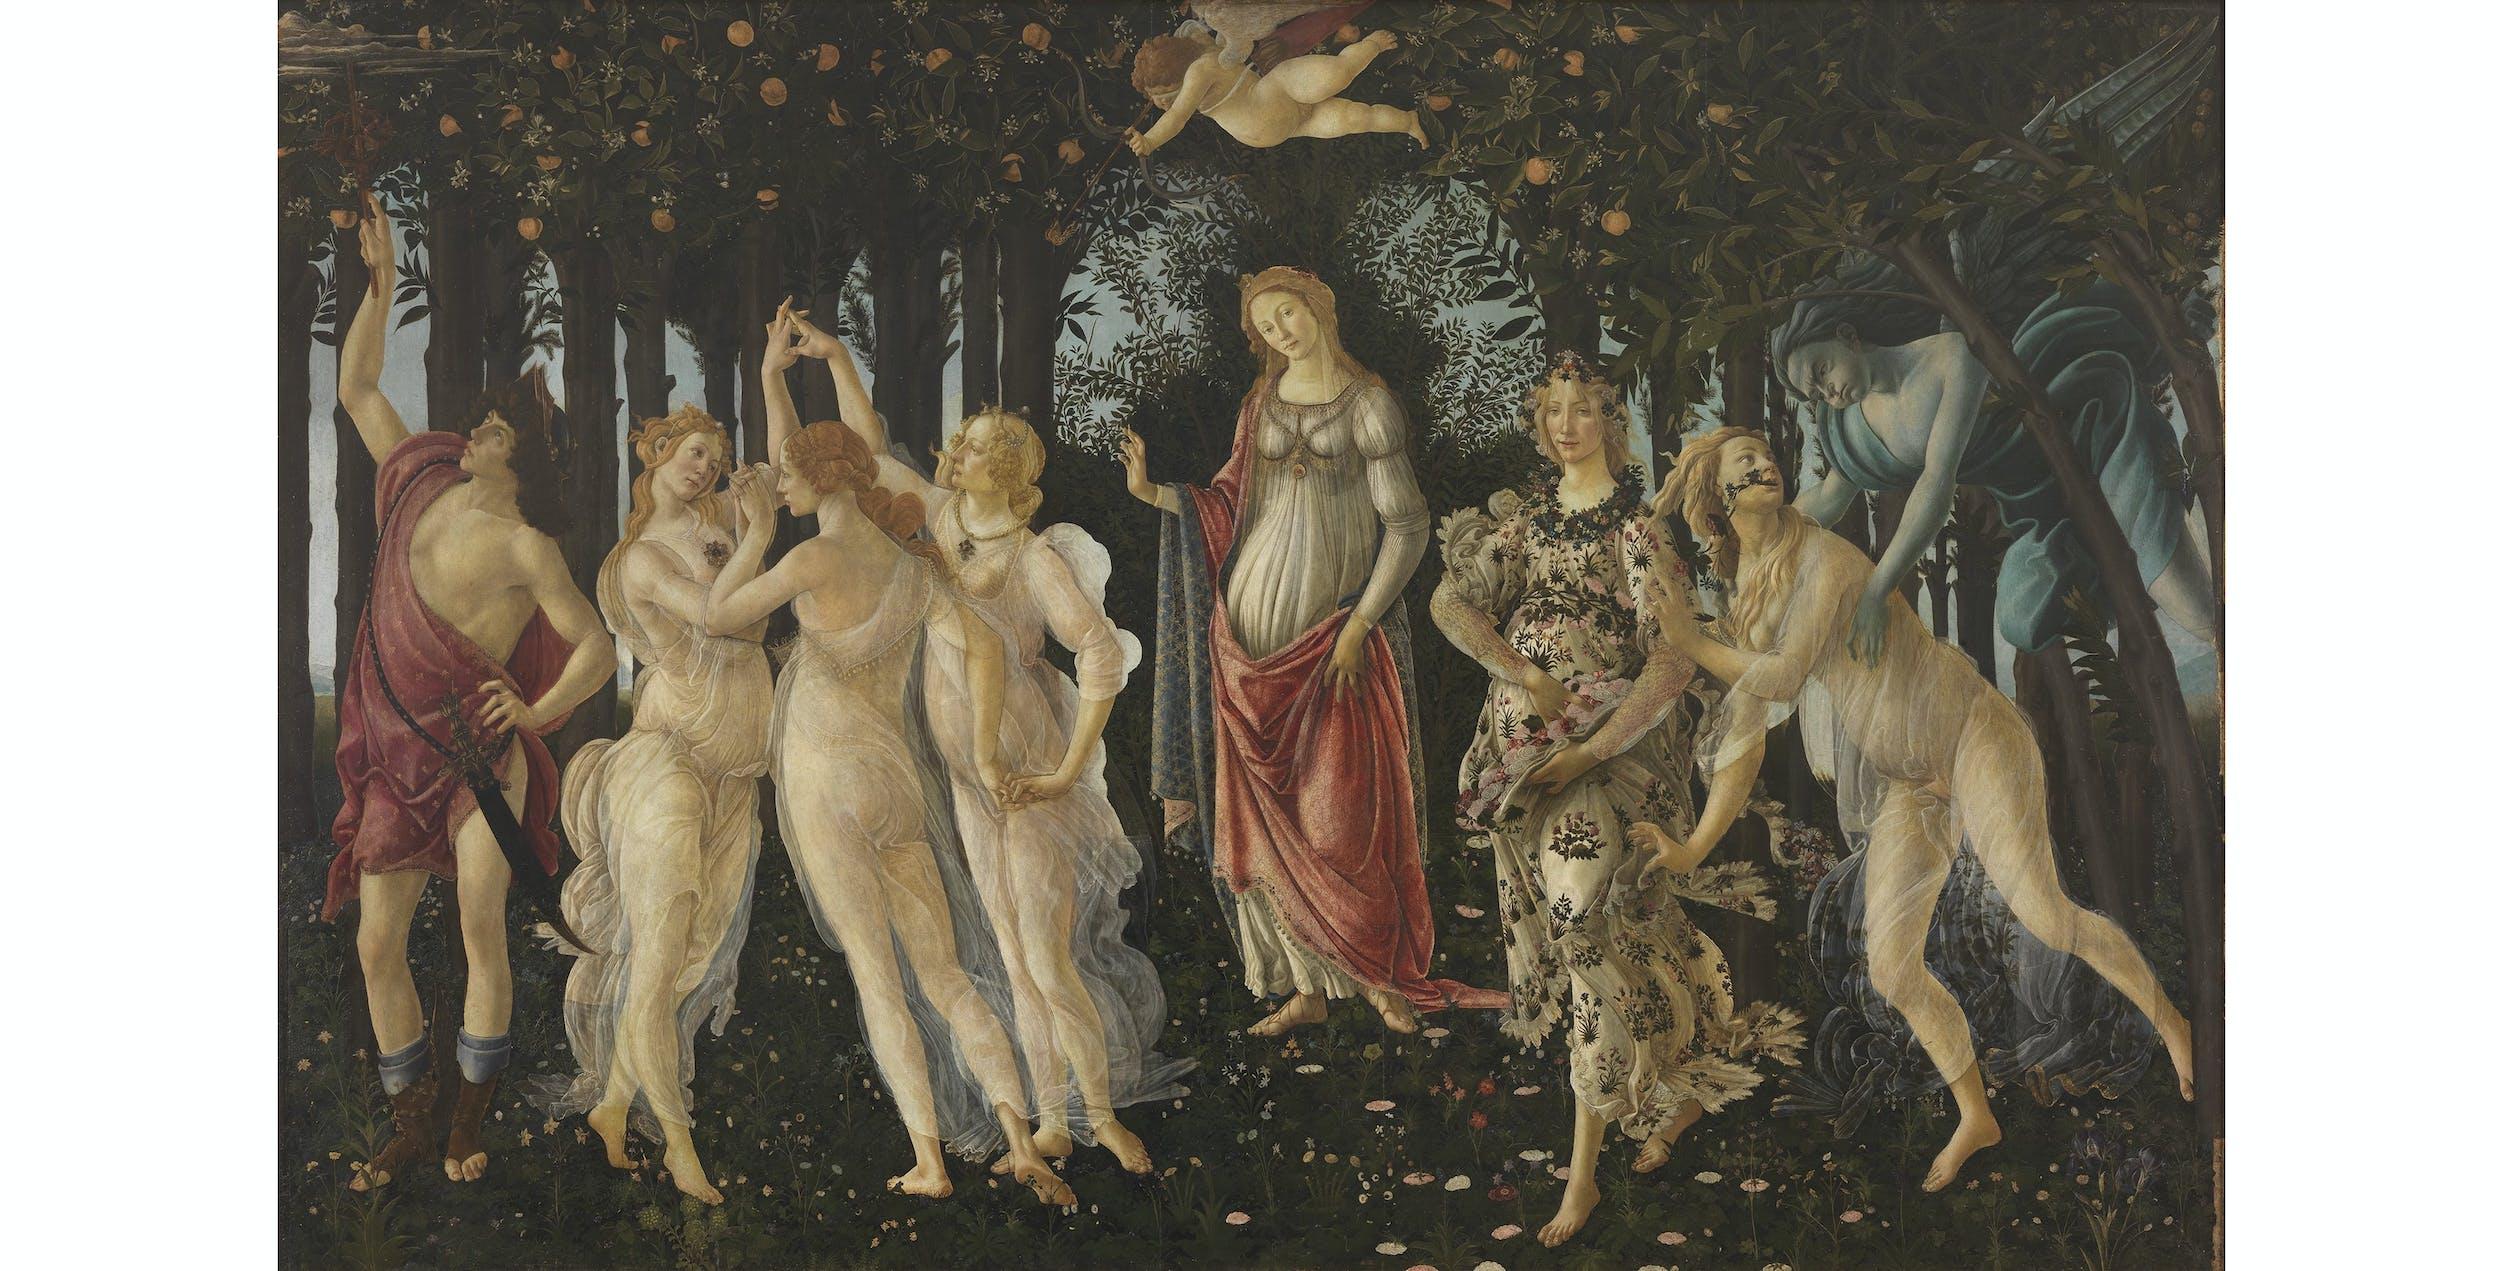 Sandro Botticelli, Primavera I Sandro Botticelli, Spring